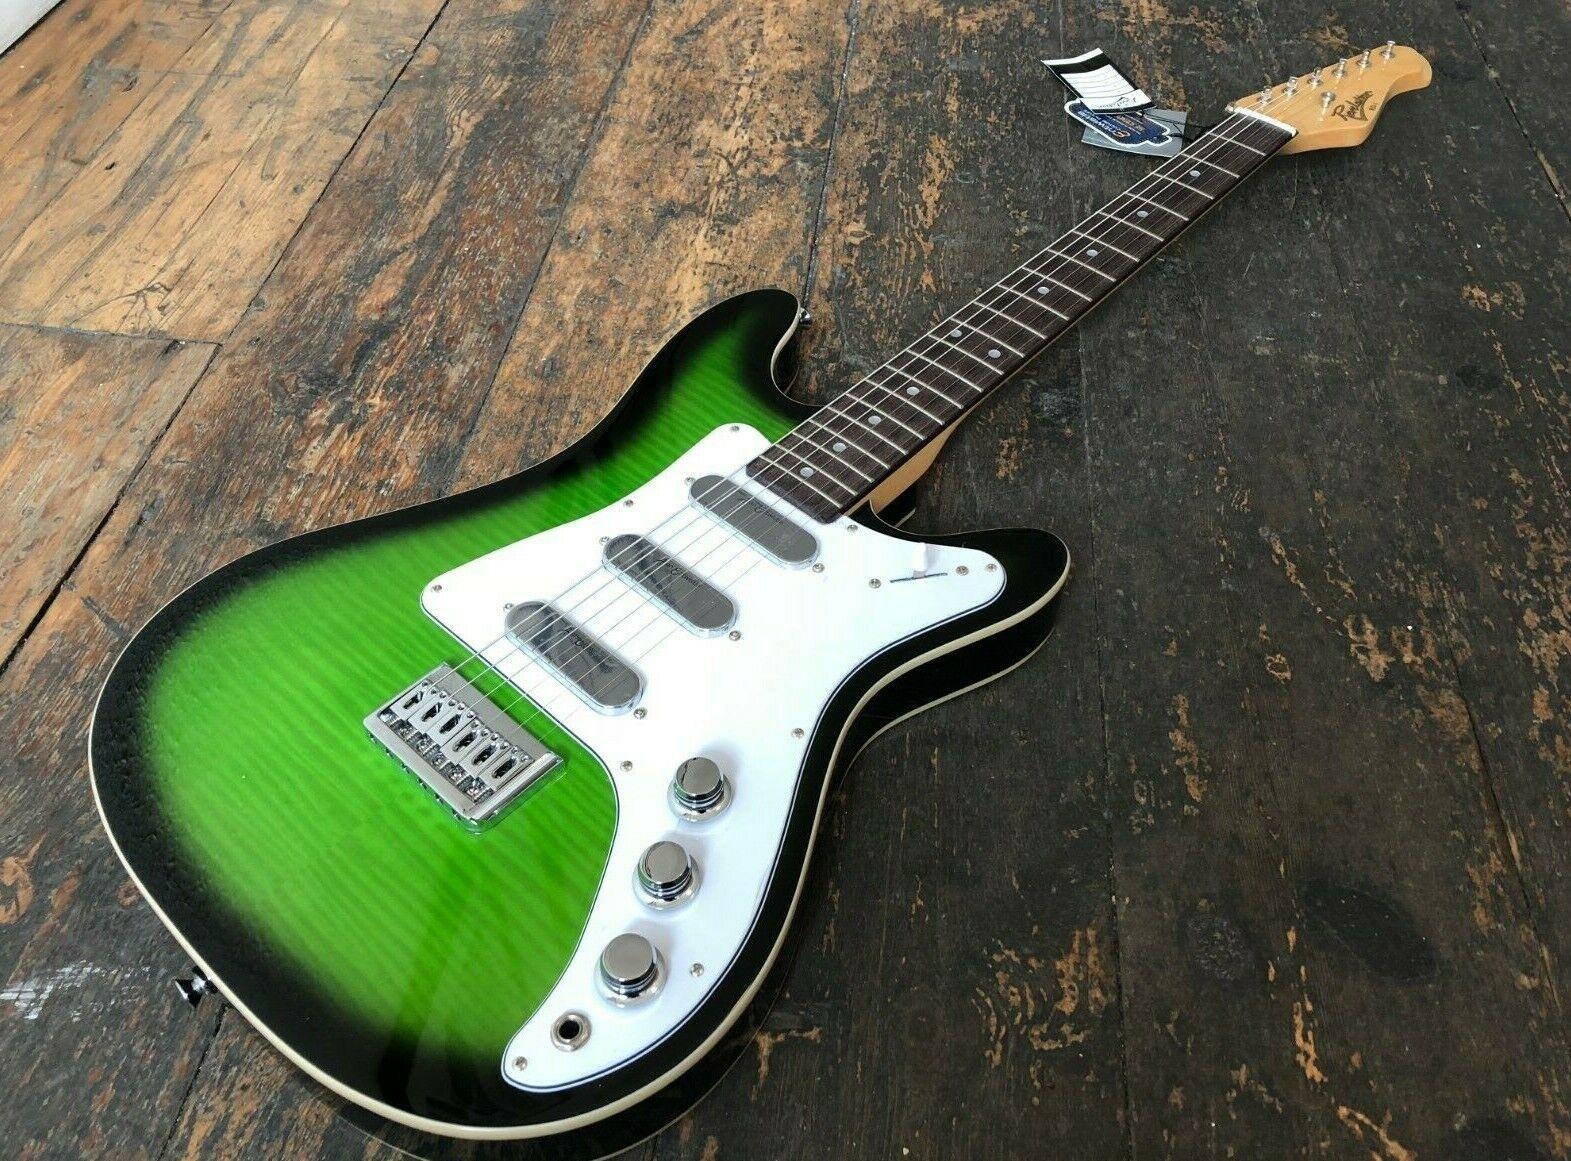 Revelation RD-1 Grün burst Electric Guitar  349.00